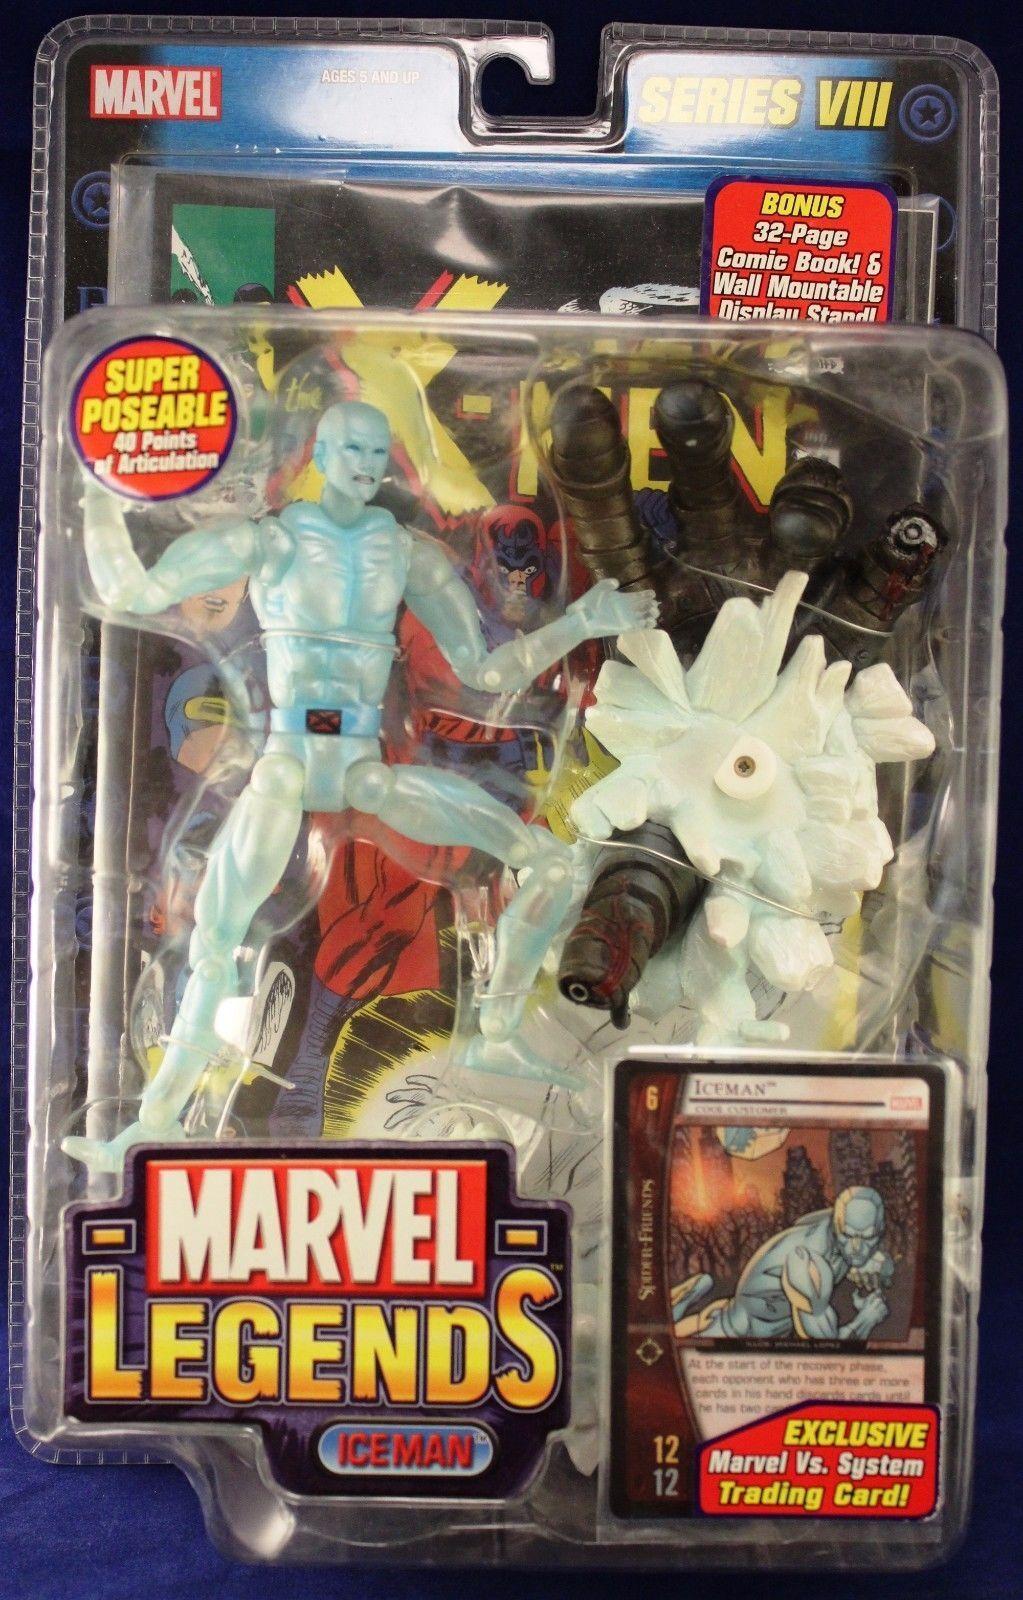 Marvel - legenden spielzeug - biz - serie 8 viii iceman bobby drake action - figur toybiz